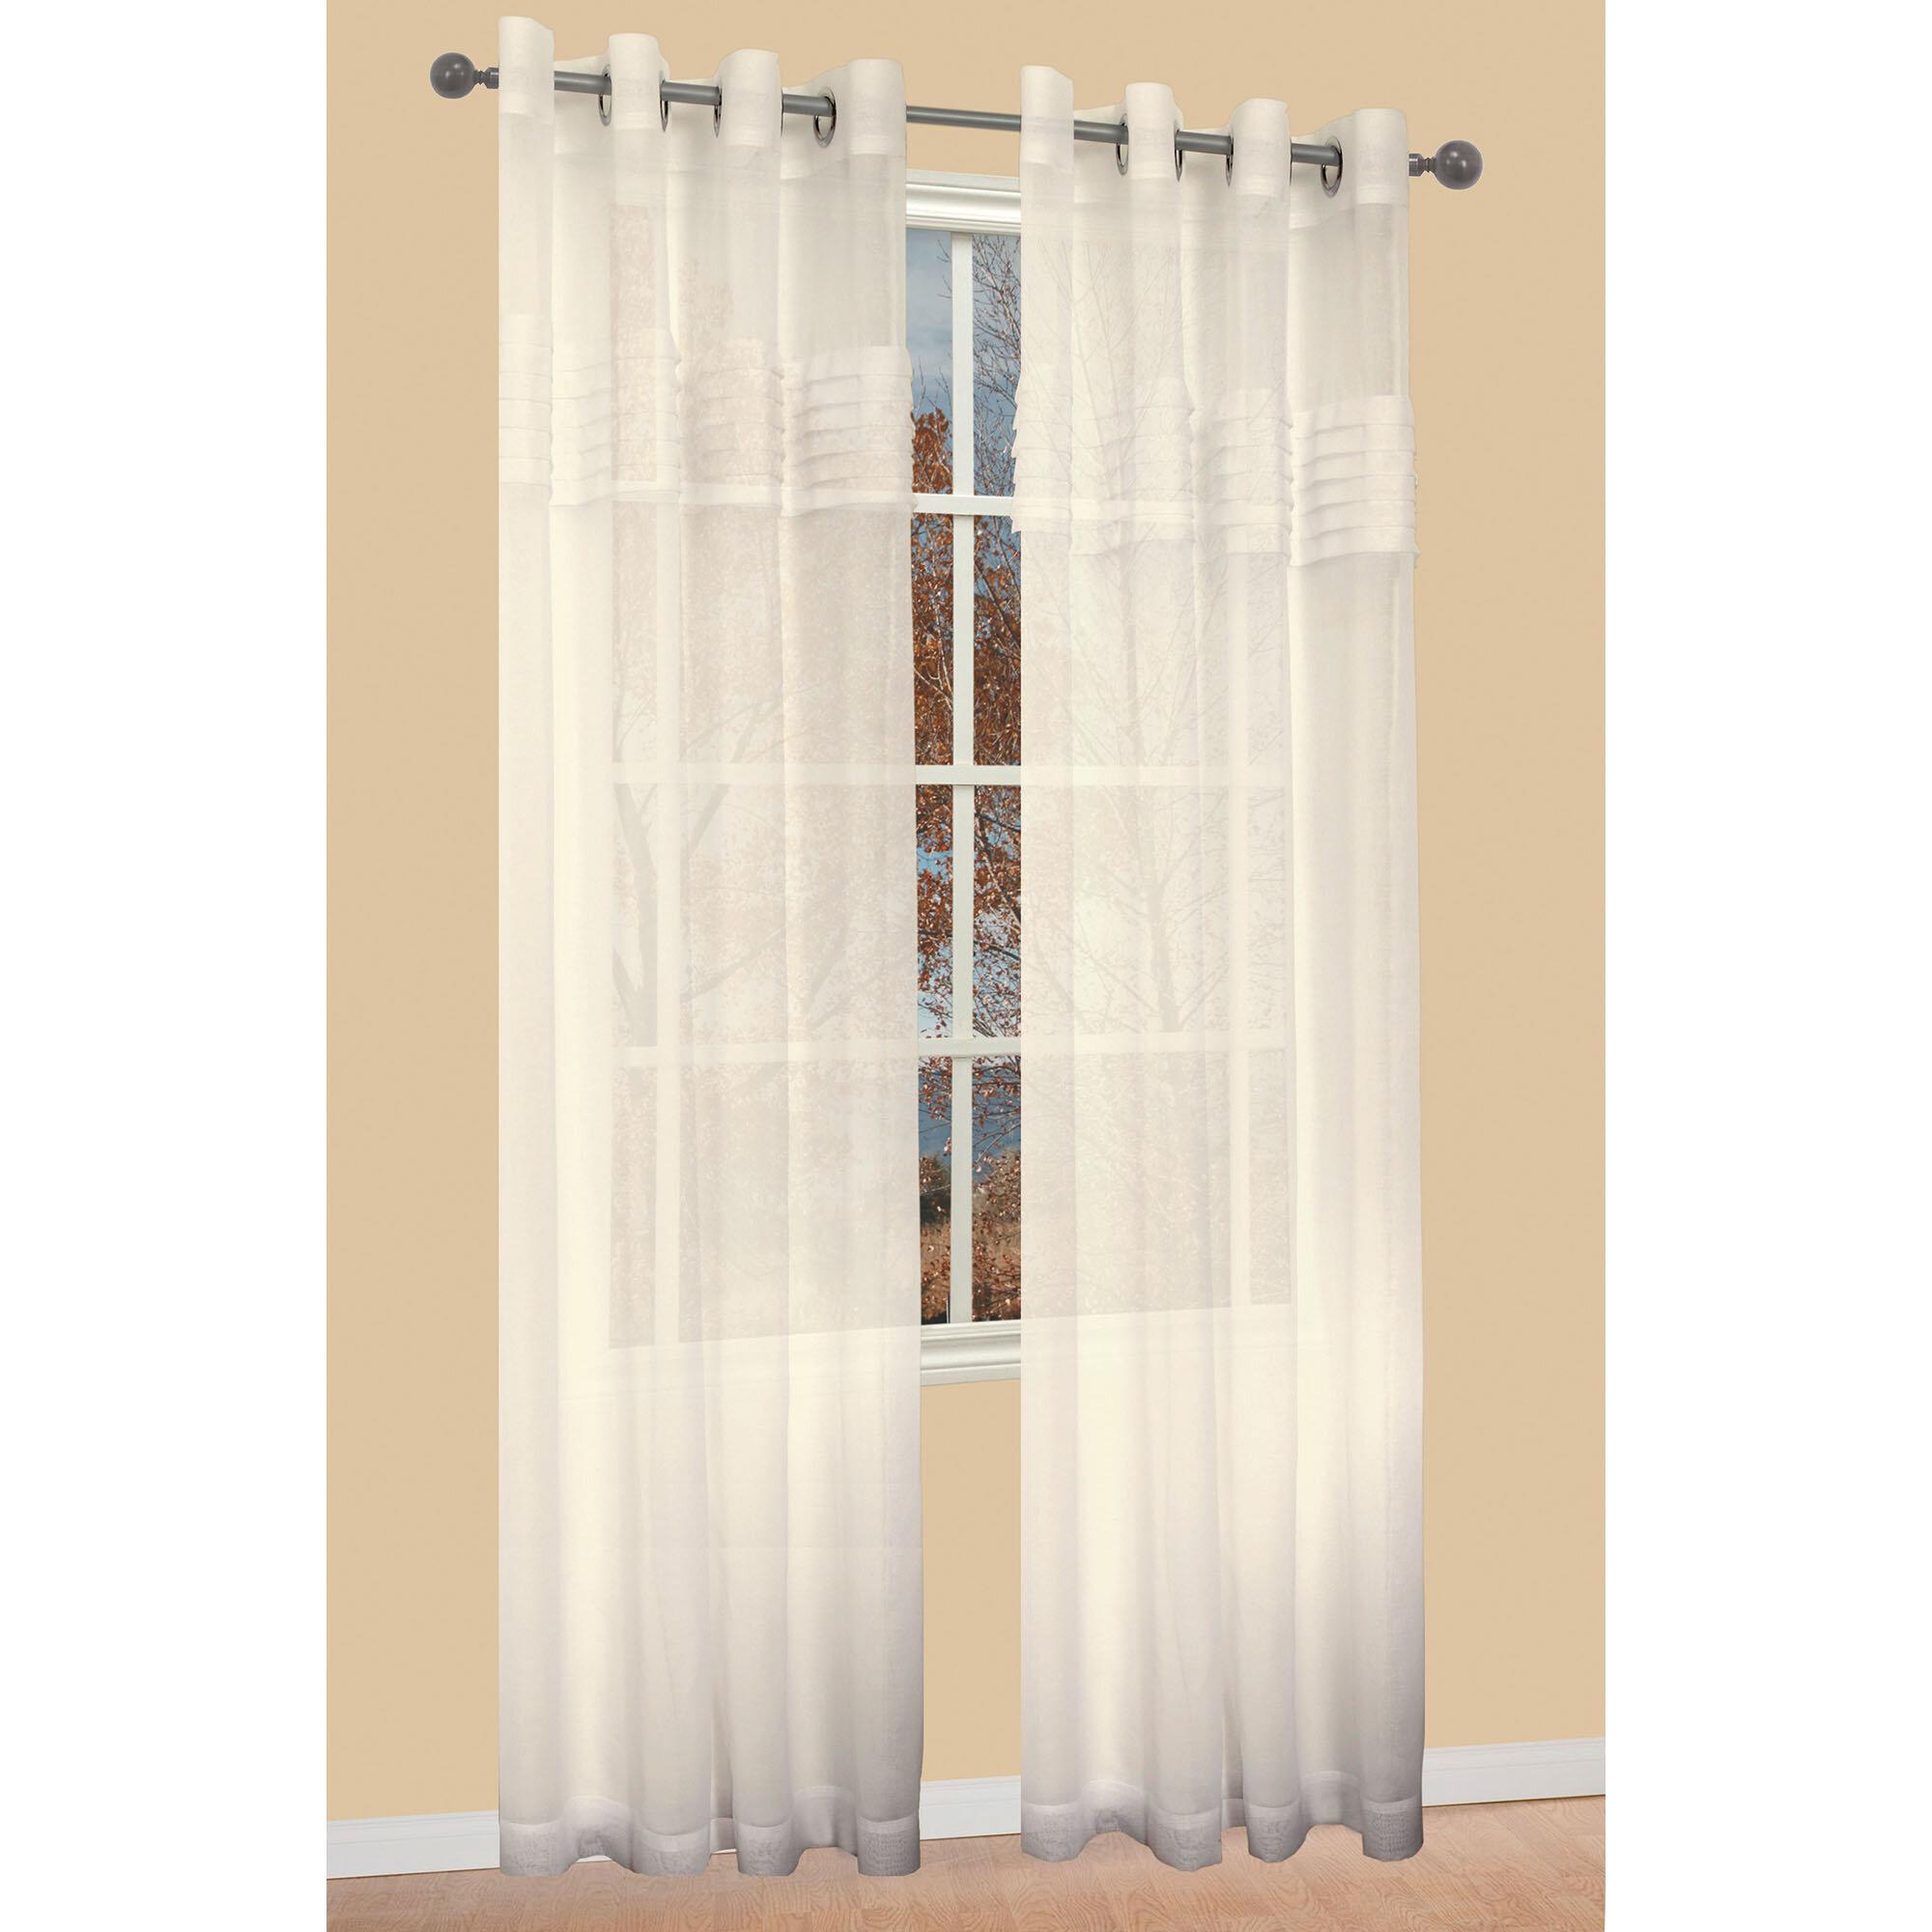 Famous Home Fashions Tuxedo Solid Sheer Grommet Single Curtain Panel Wayfair